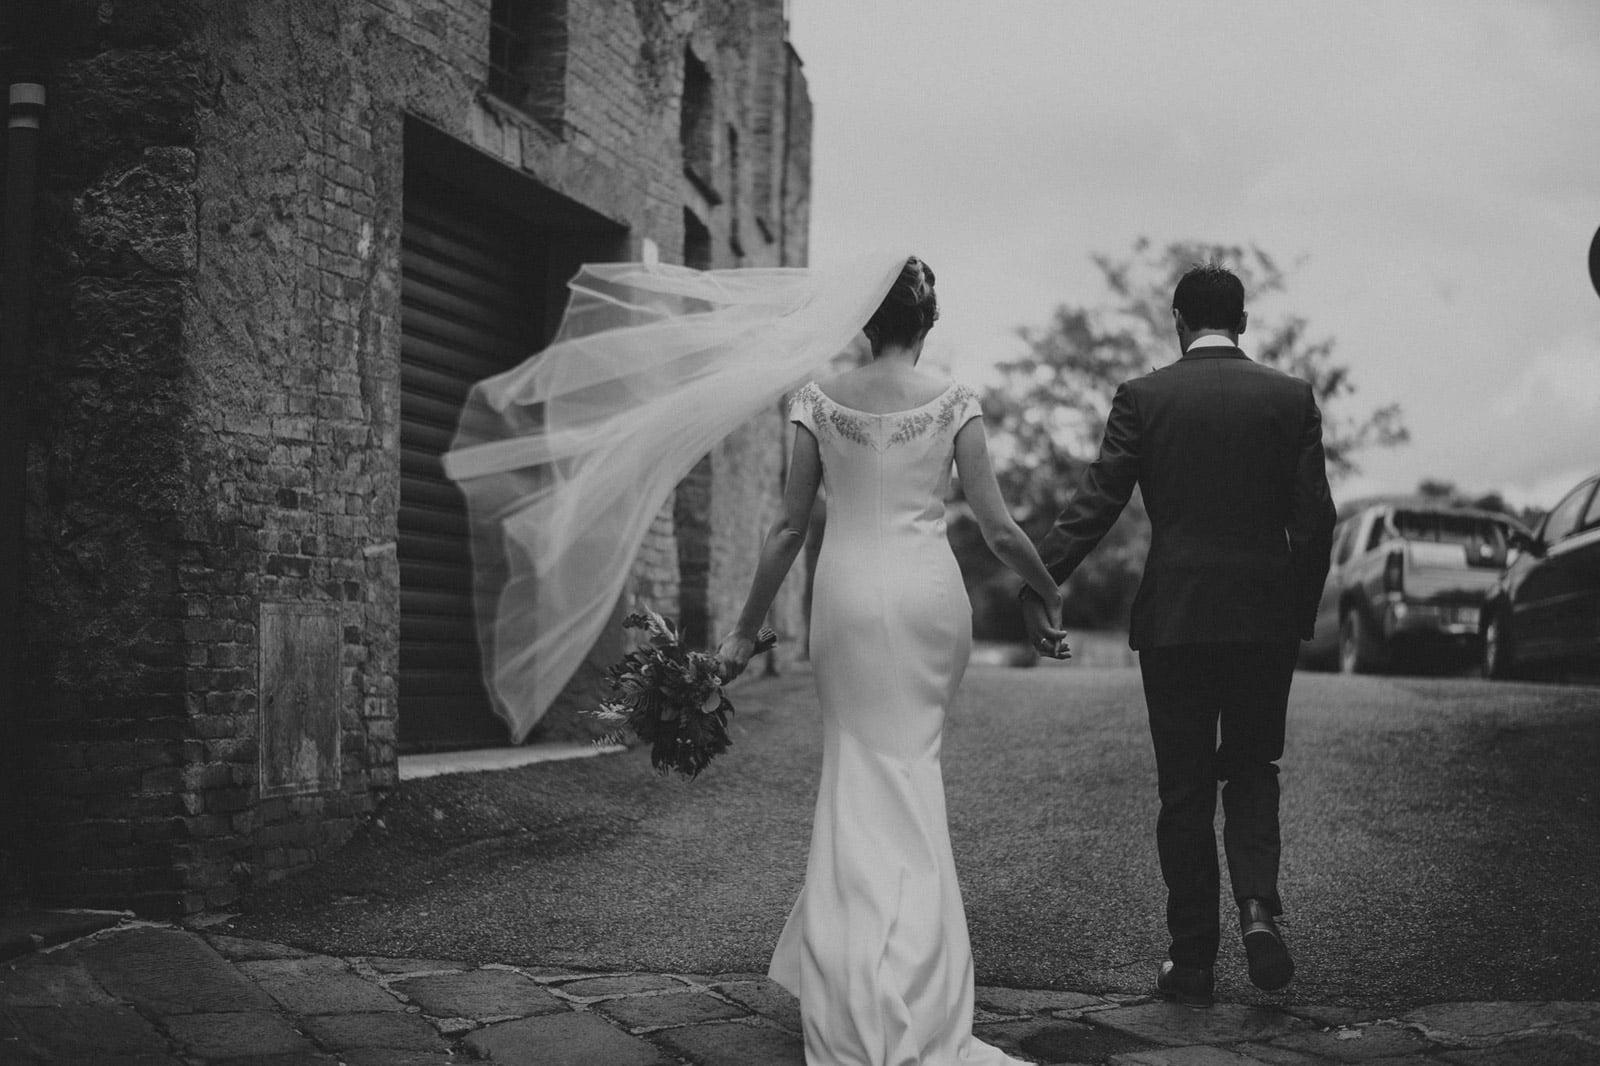 081-wedding-tuscany-san-galgano-federico-pannacci-photographer